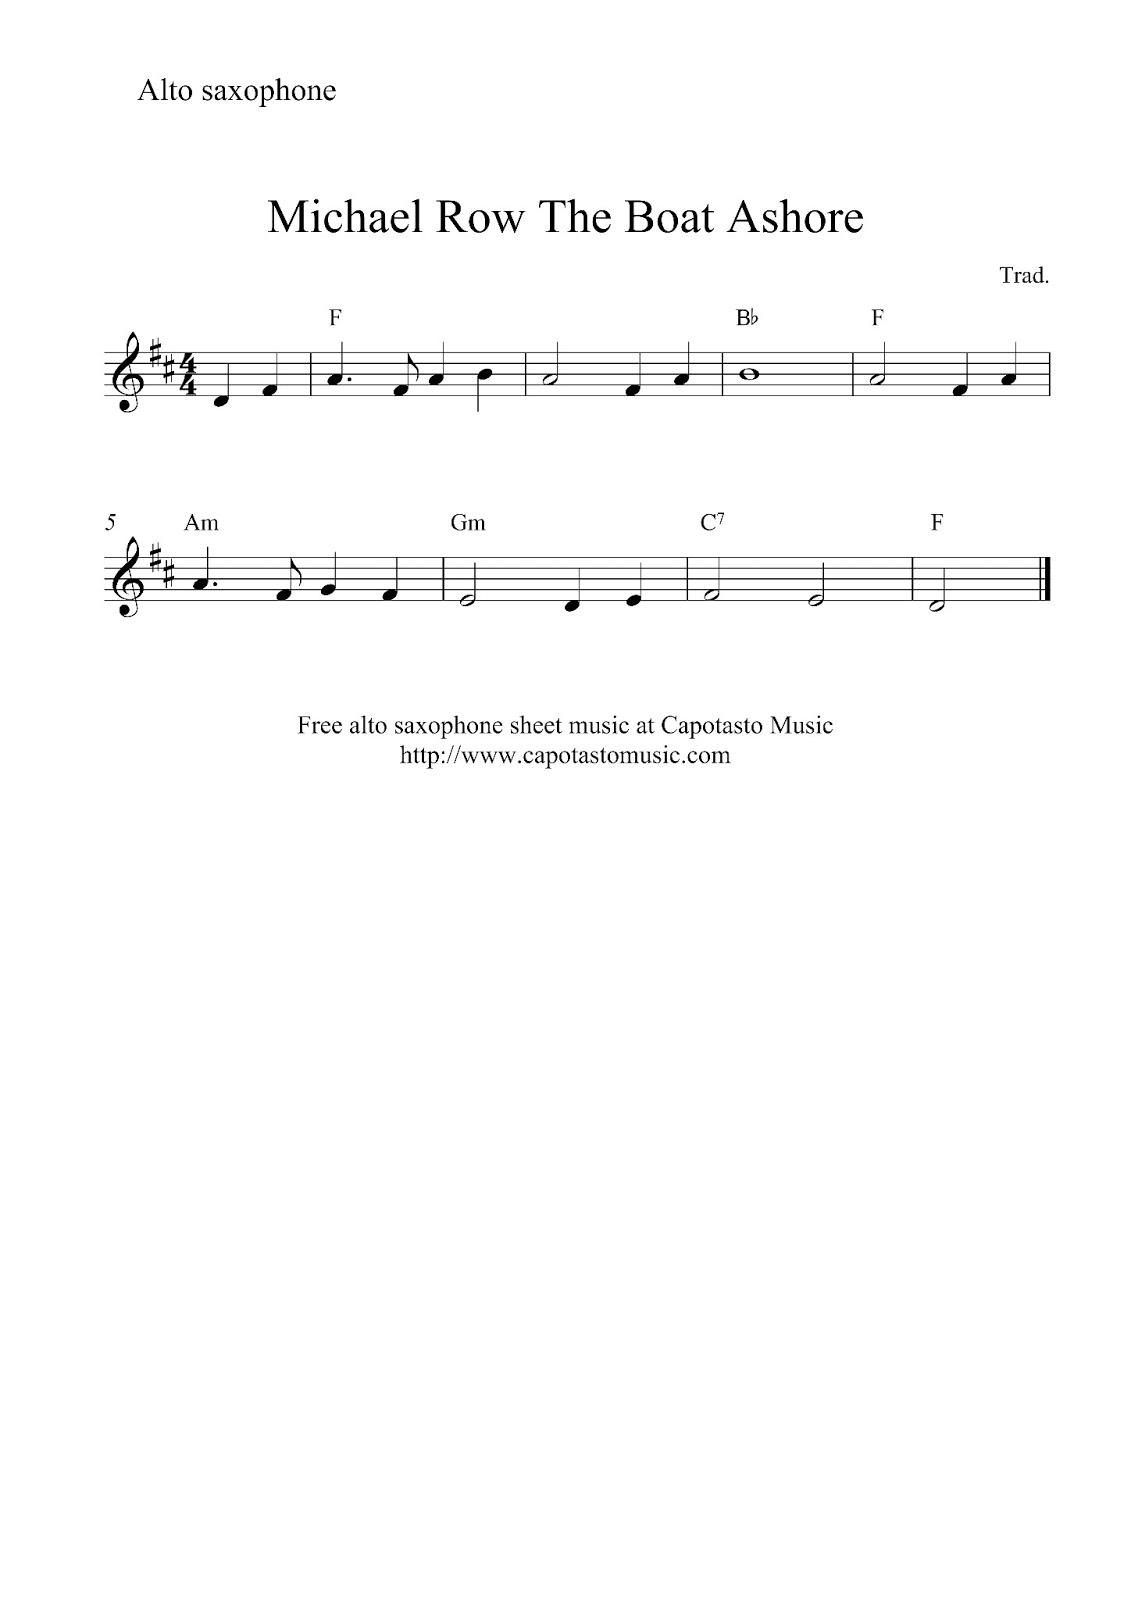 Free Easy Alto Saxophone Sheet Music, Michael Row The Boat Ashore - Free Printable Alto Saxophone Sheet Music